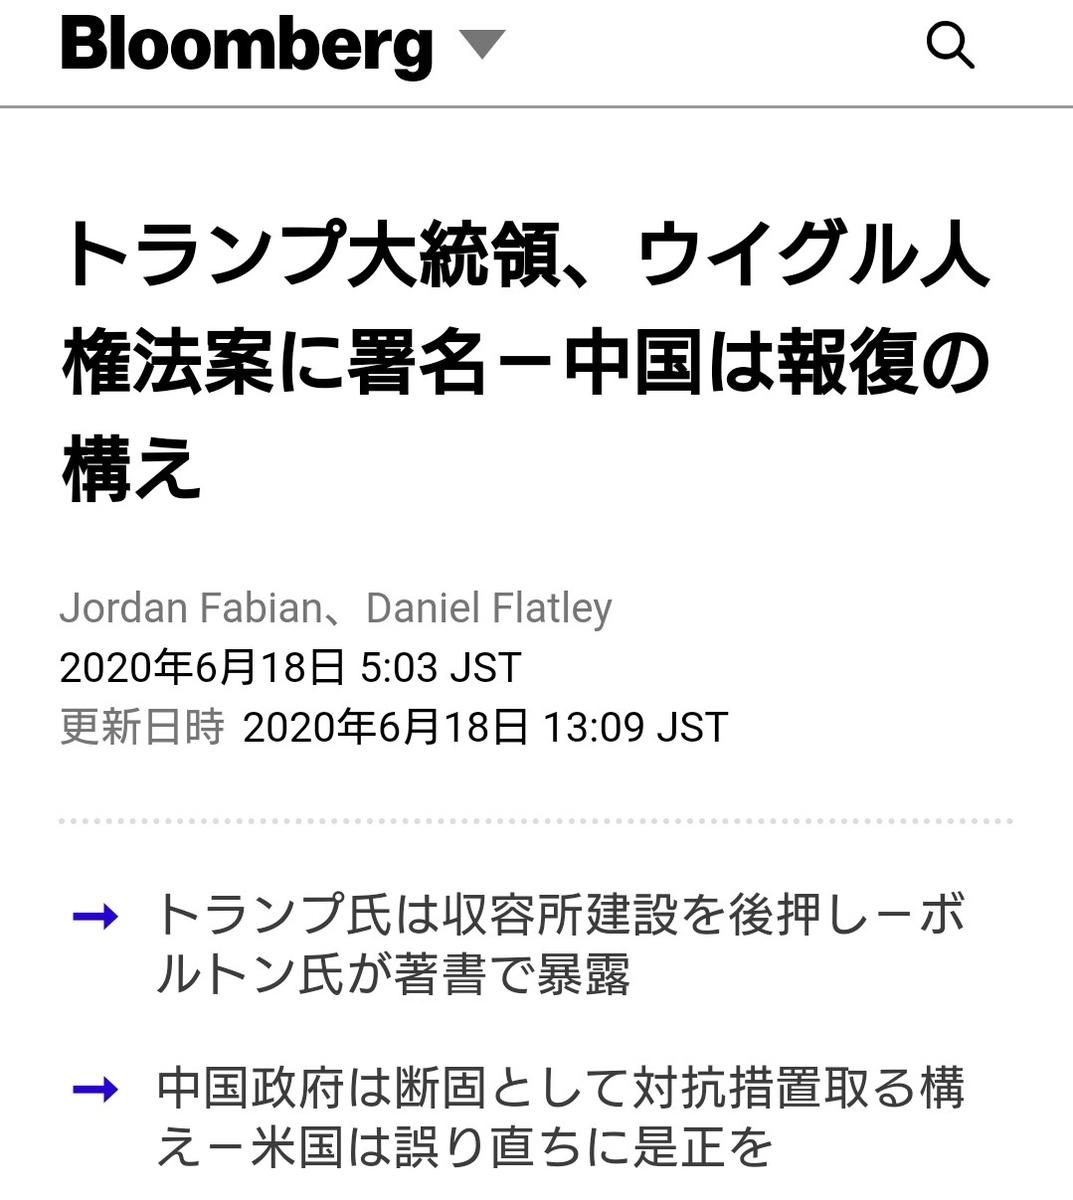 f:id:wasurenagusa7531kuma:20210201073221j:plain